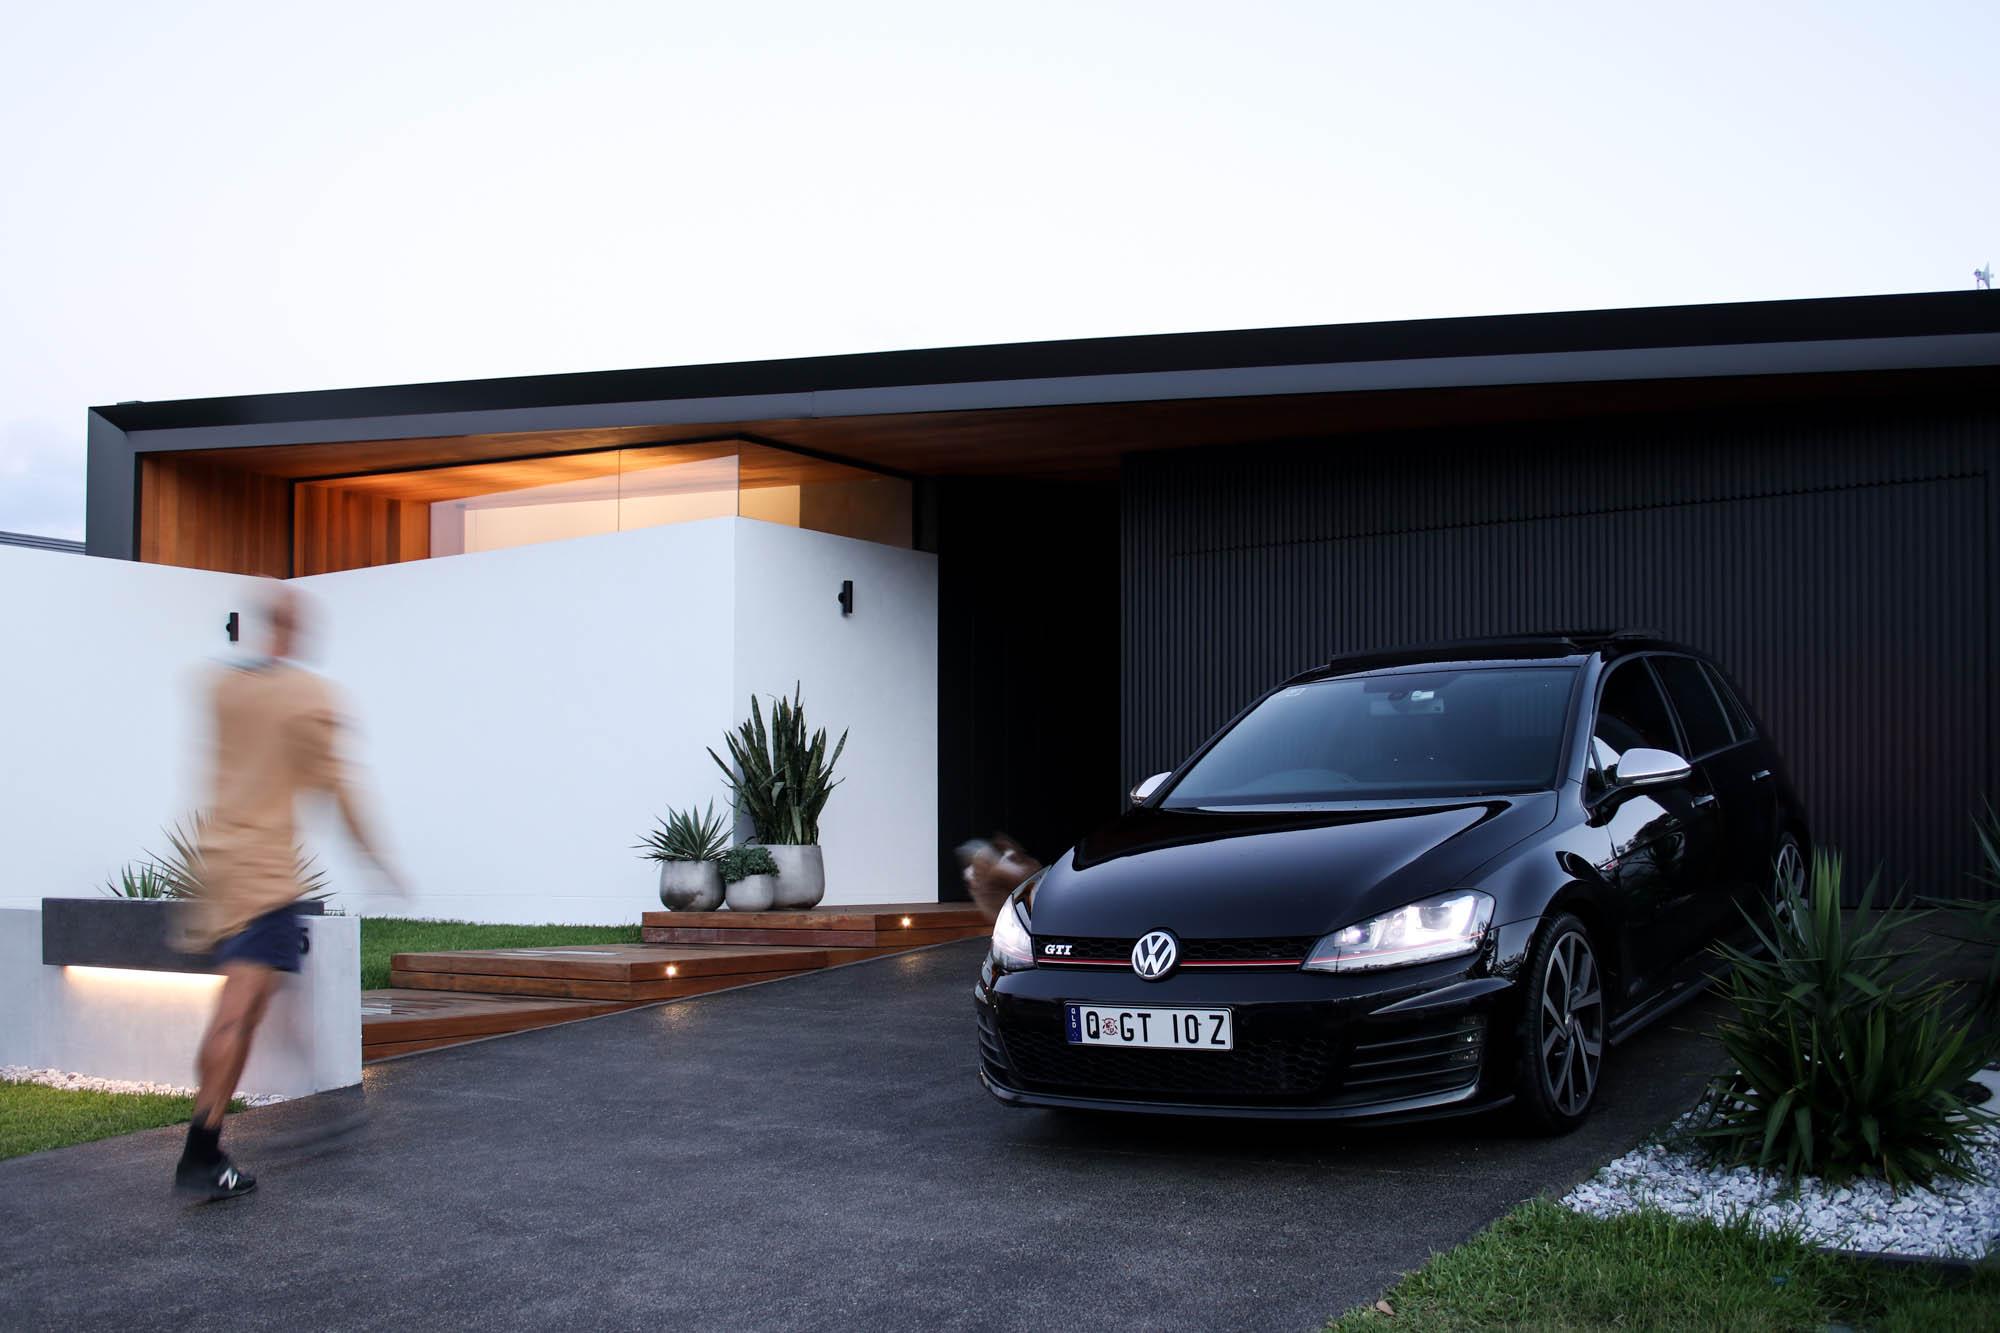 lawrie driveway entry